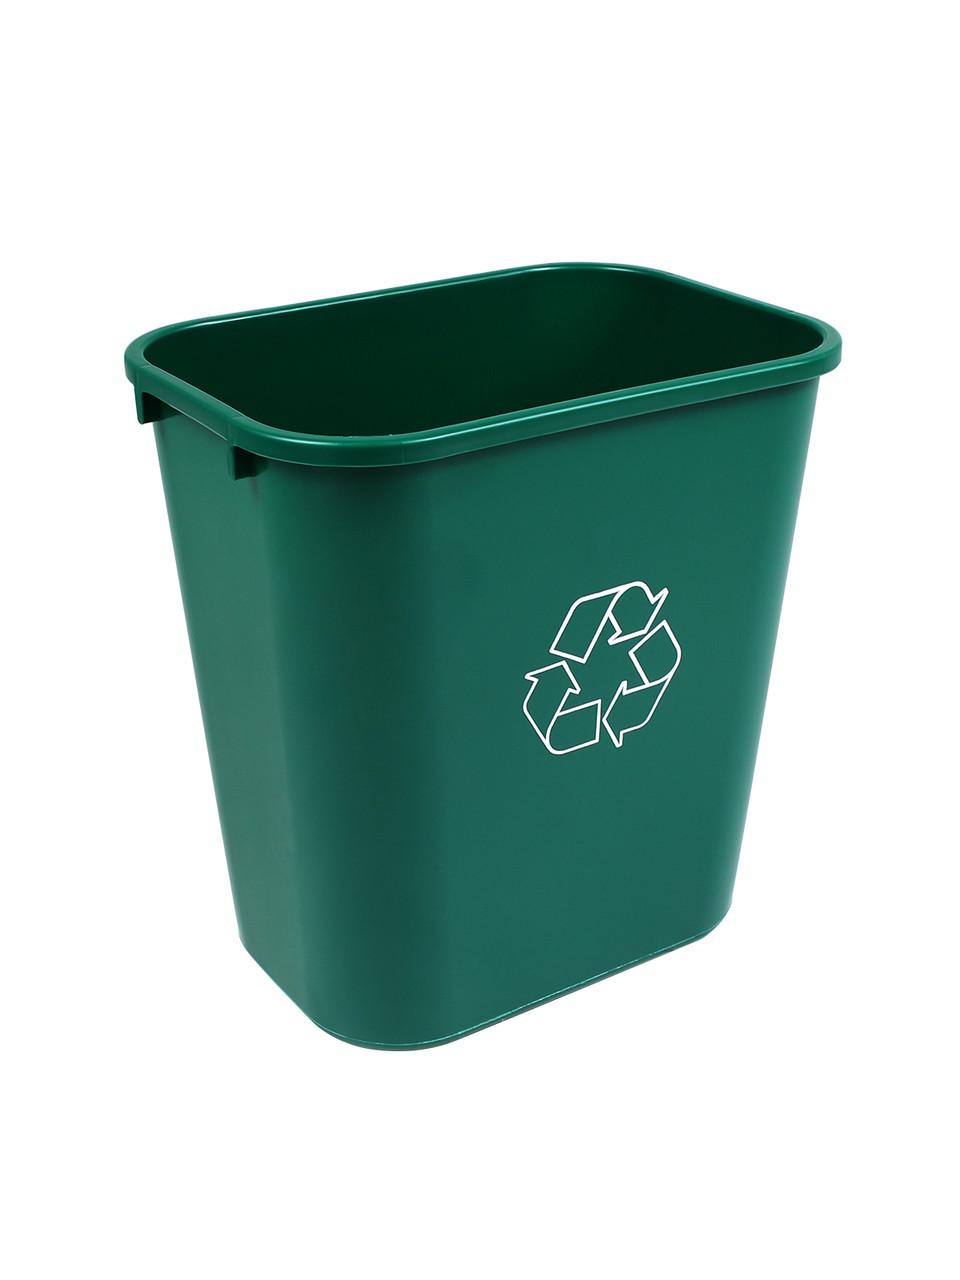 28 Quart Green Kitchen Recycle Wastebasket 28Q (2 Pack)